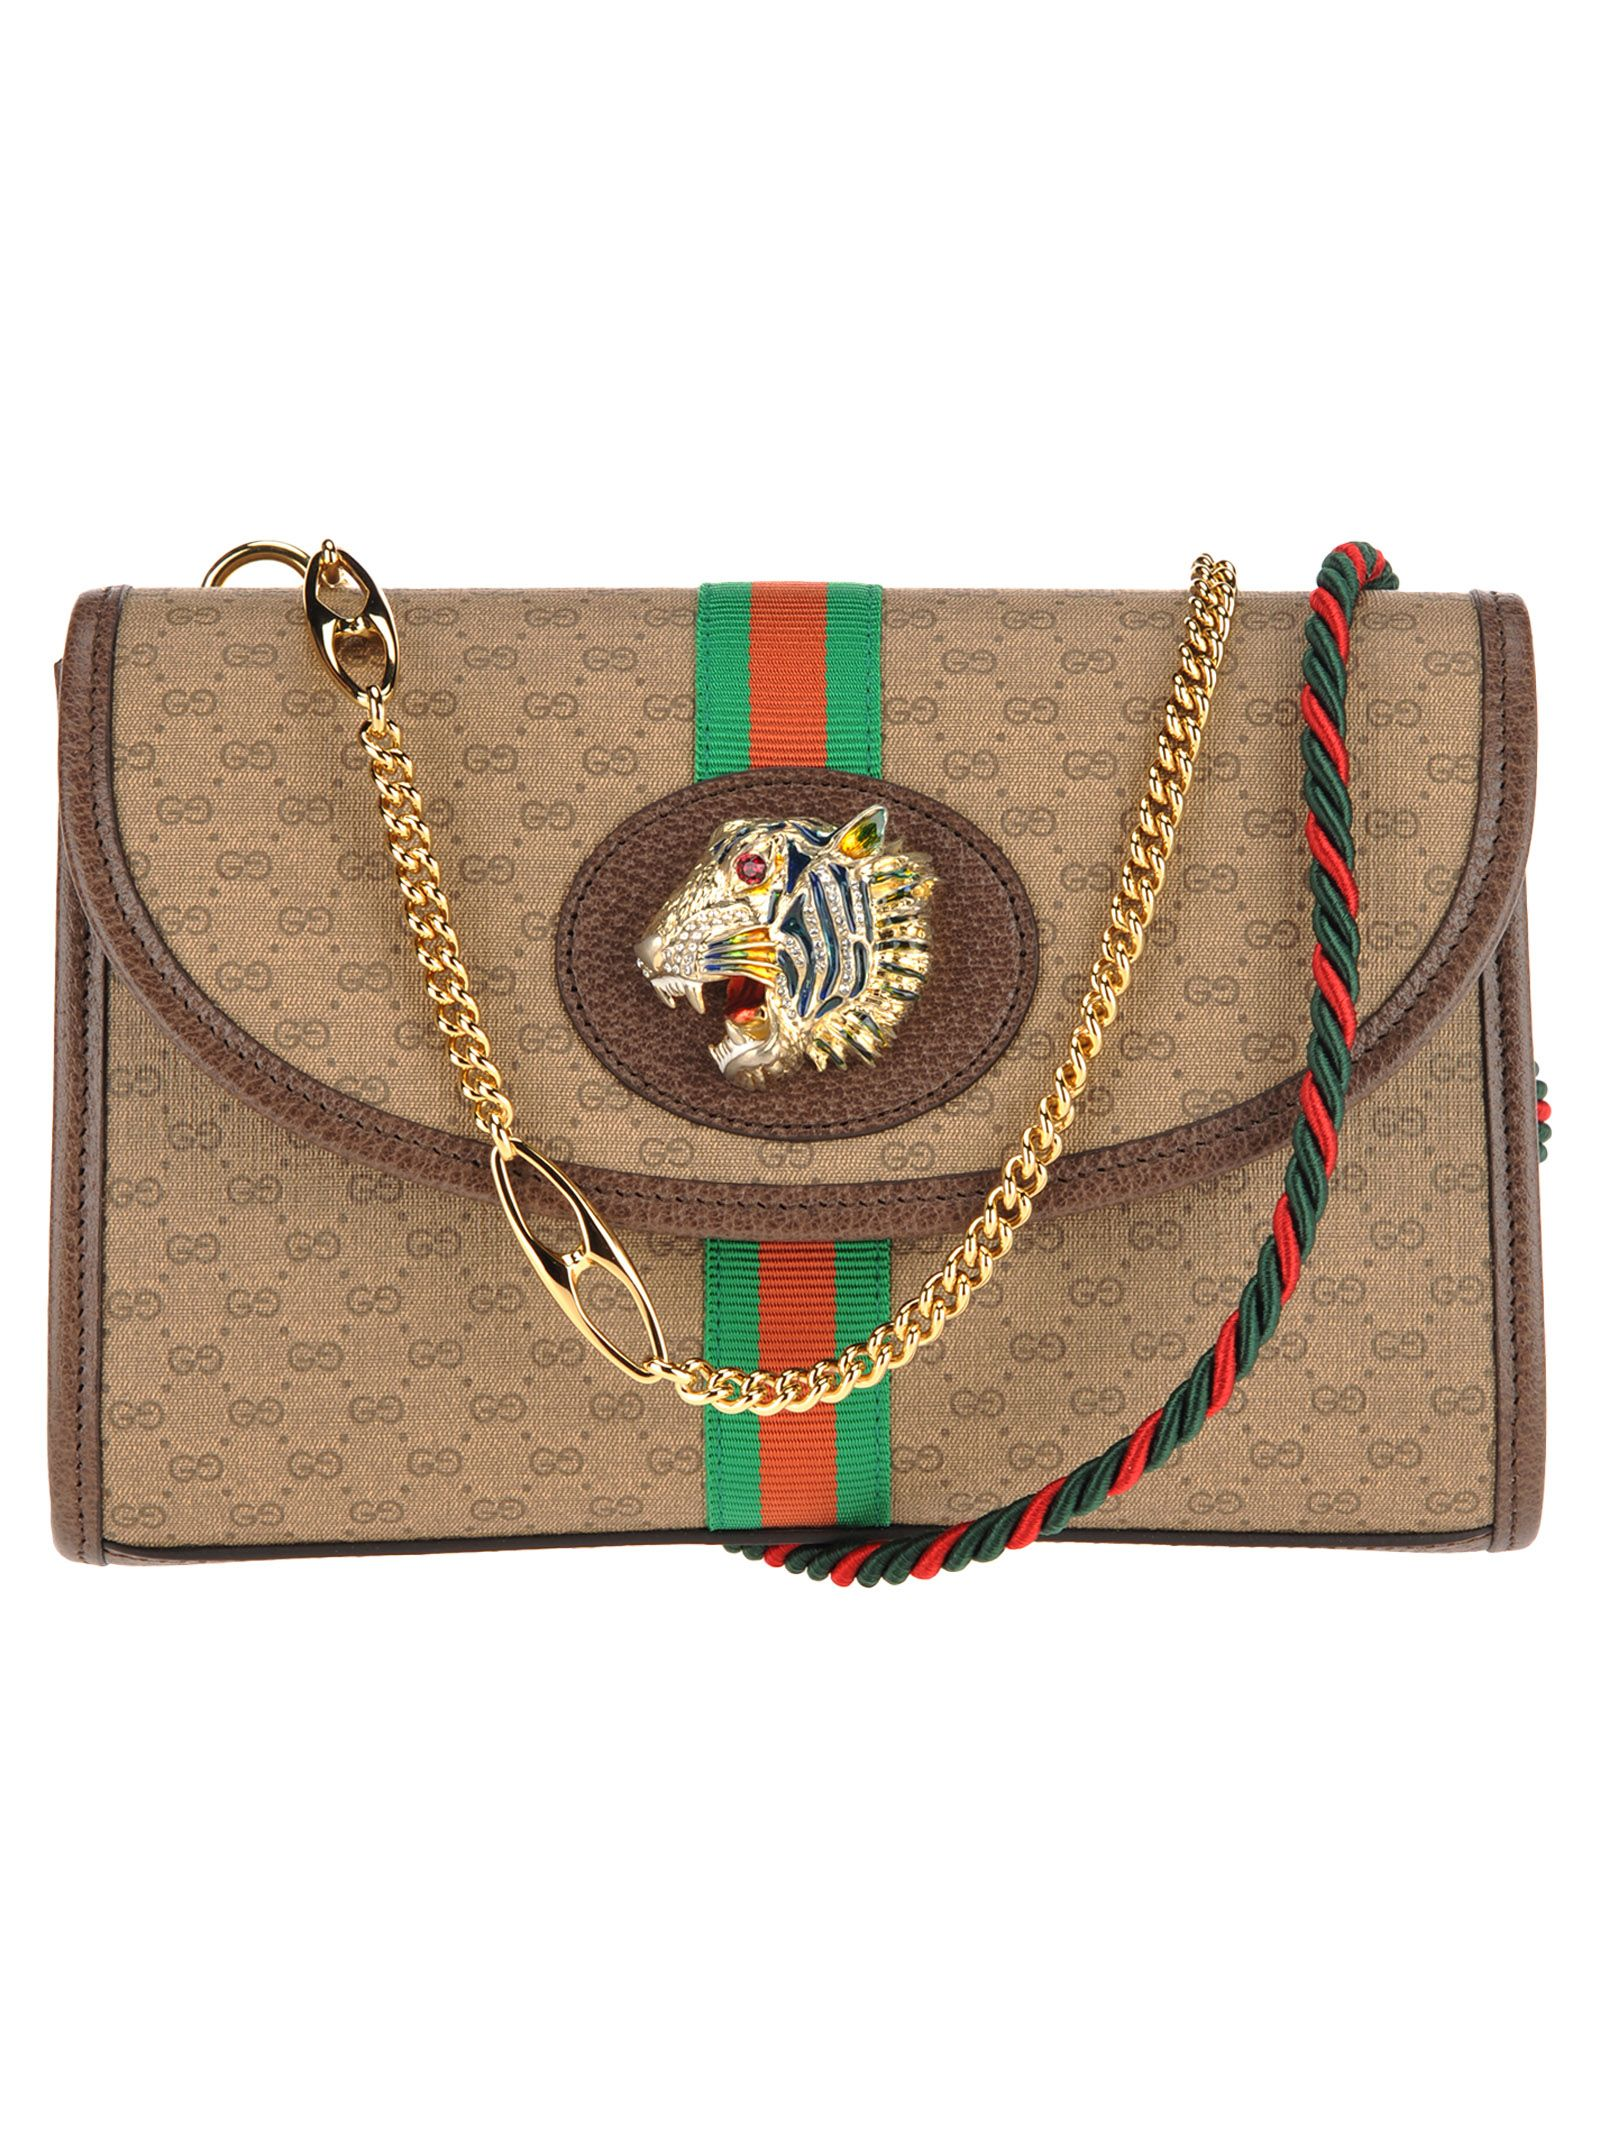 0c6082123b1 Gucci Gucci Rajah Supreme Gg Chian Bag Small - BEIGE EBONY ...